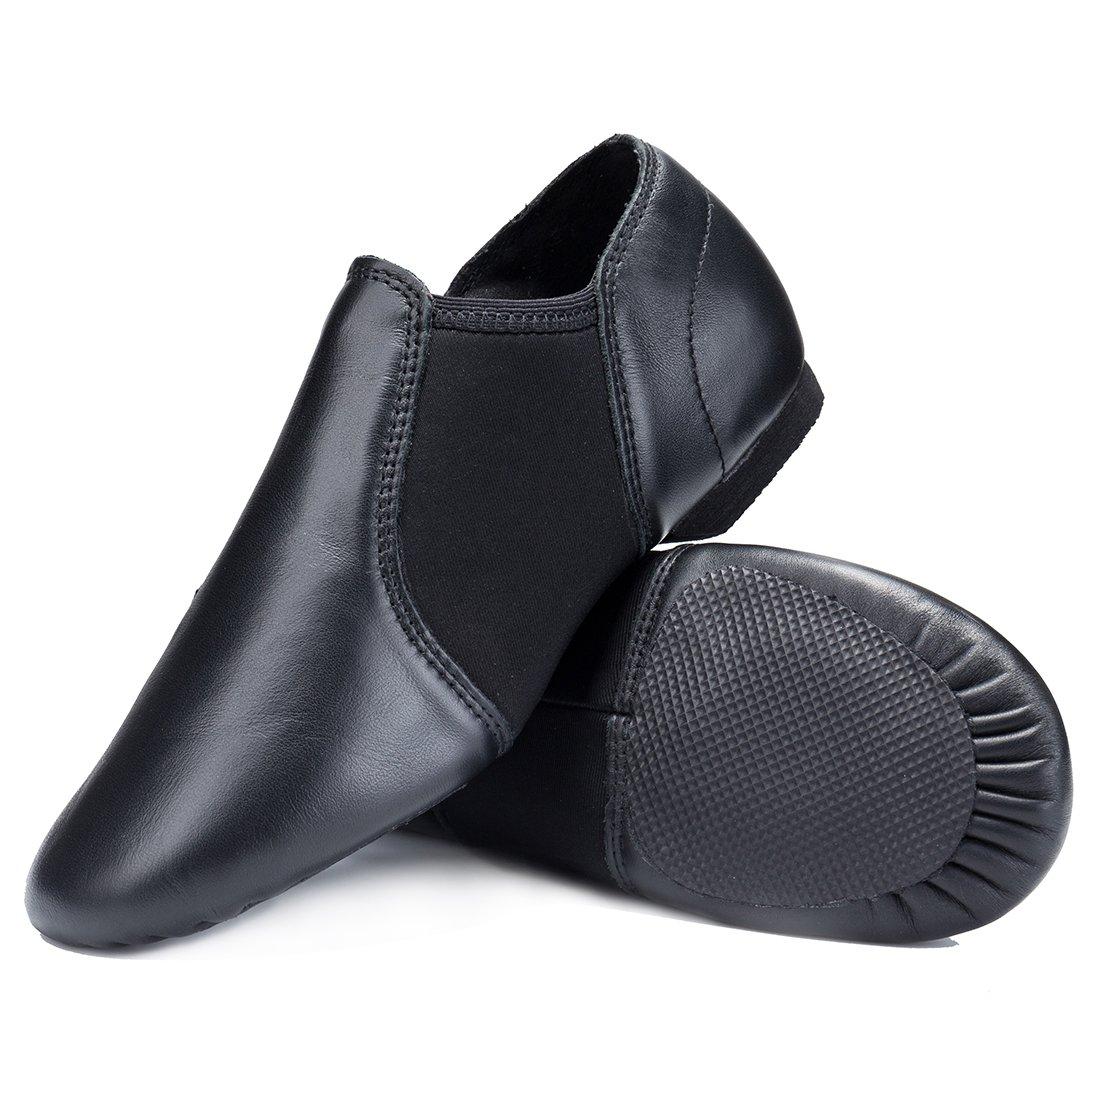 STELLE Leather Slip-on Jazz Shoes for Girls Boys Kids (Little Kid 12.5M US, Black)